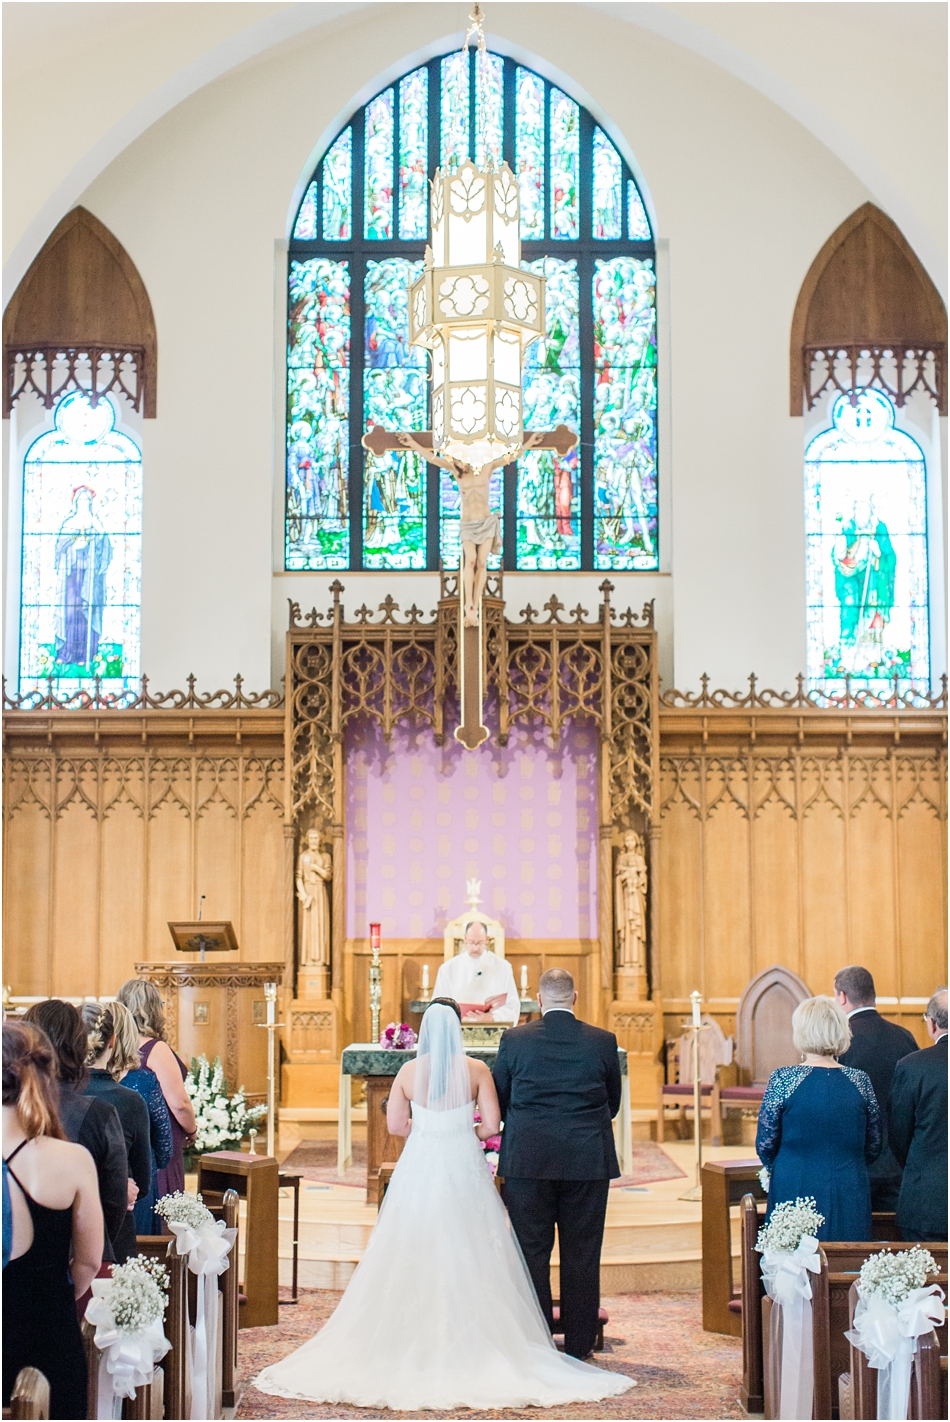 north_reading_lauren_sal_ballroom_cape_cod_boston_new_england_wedding_photographer_Meredith_Jane_Photography_photo_0111.jpg